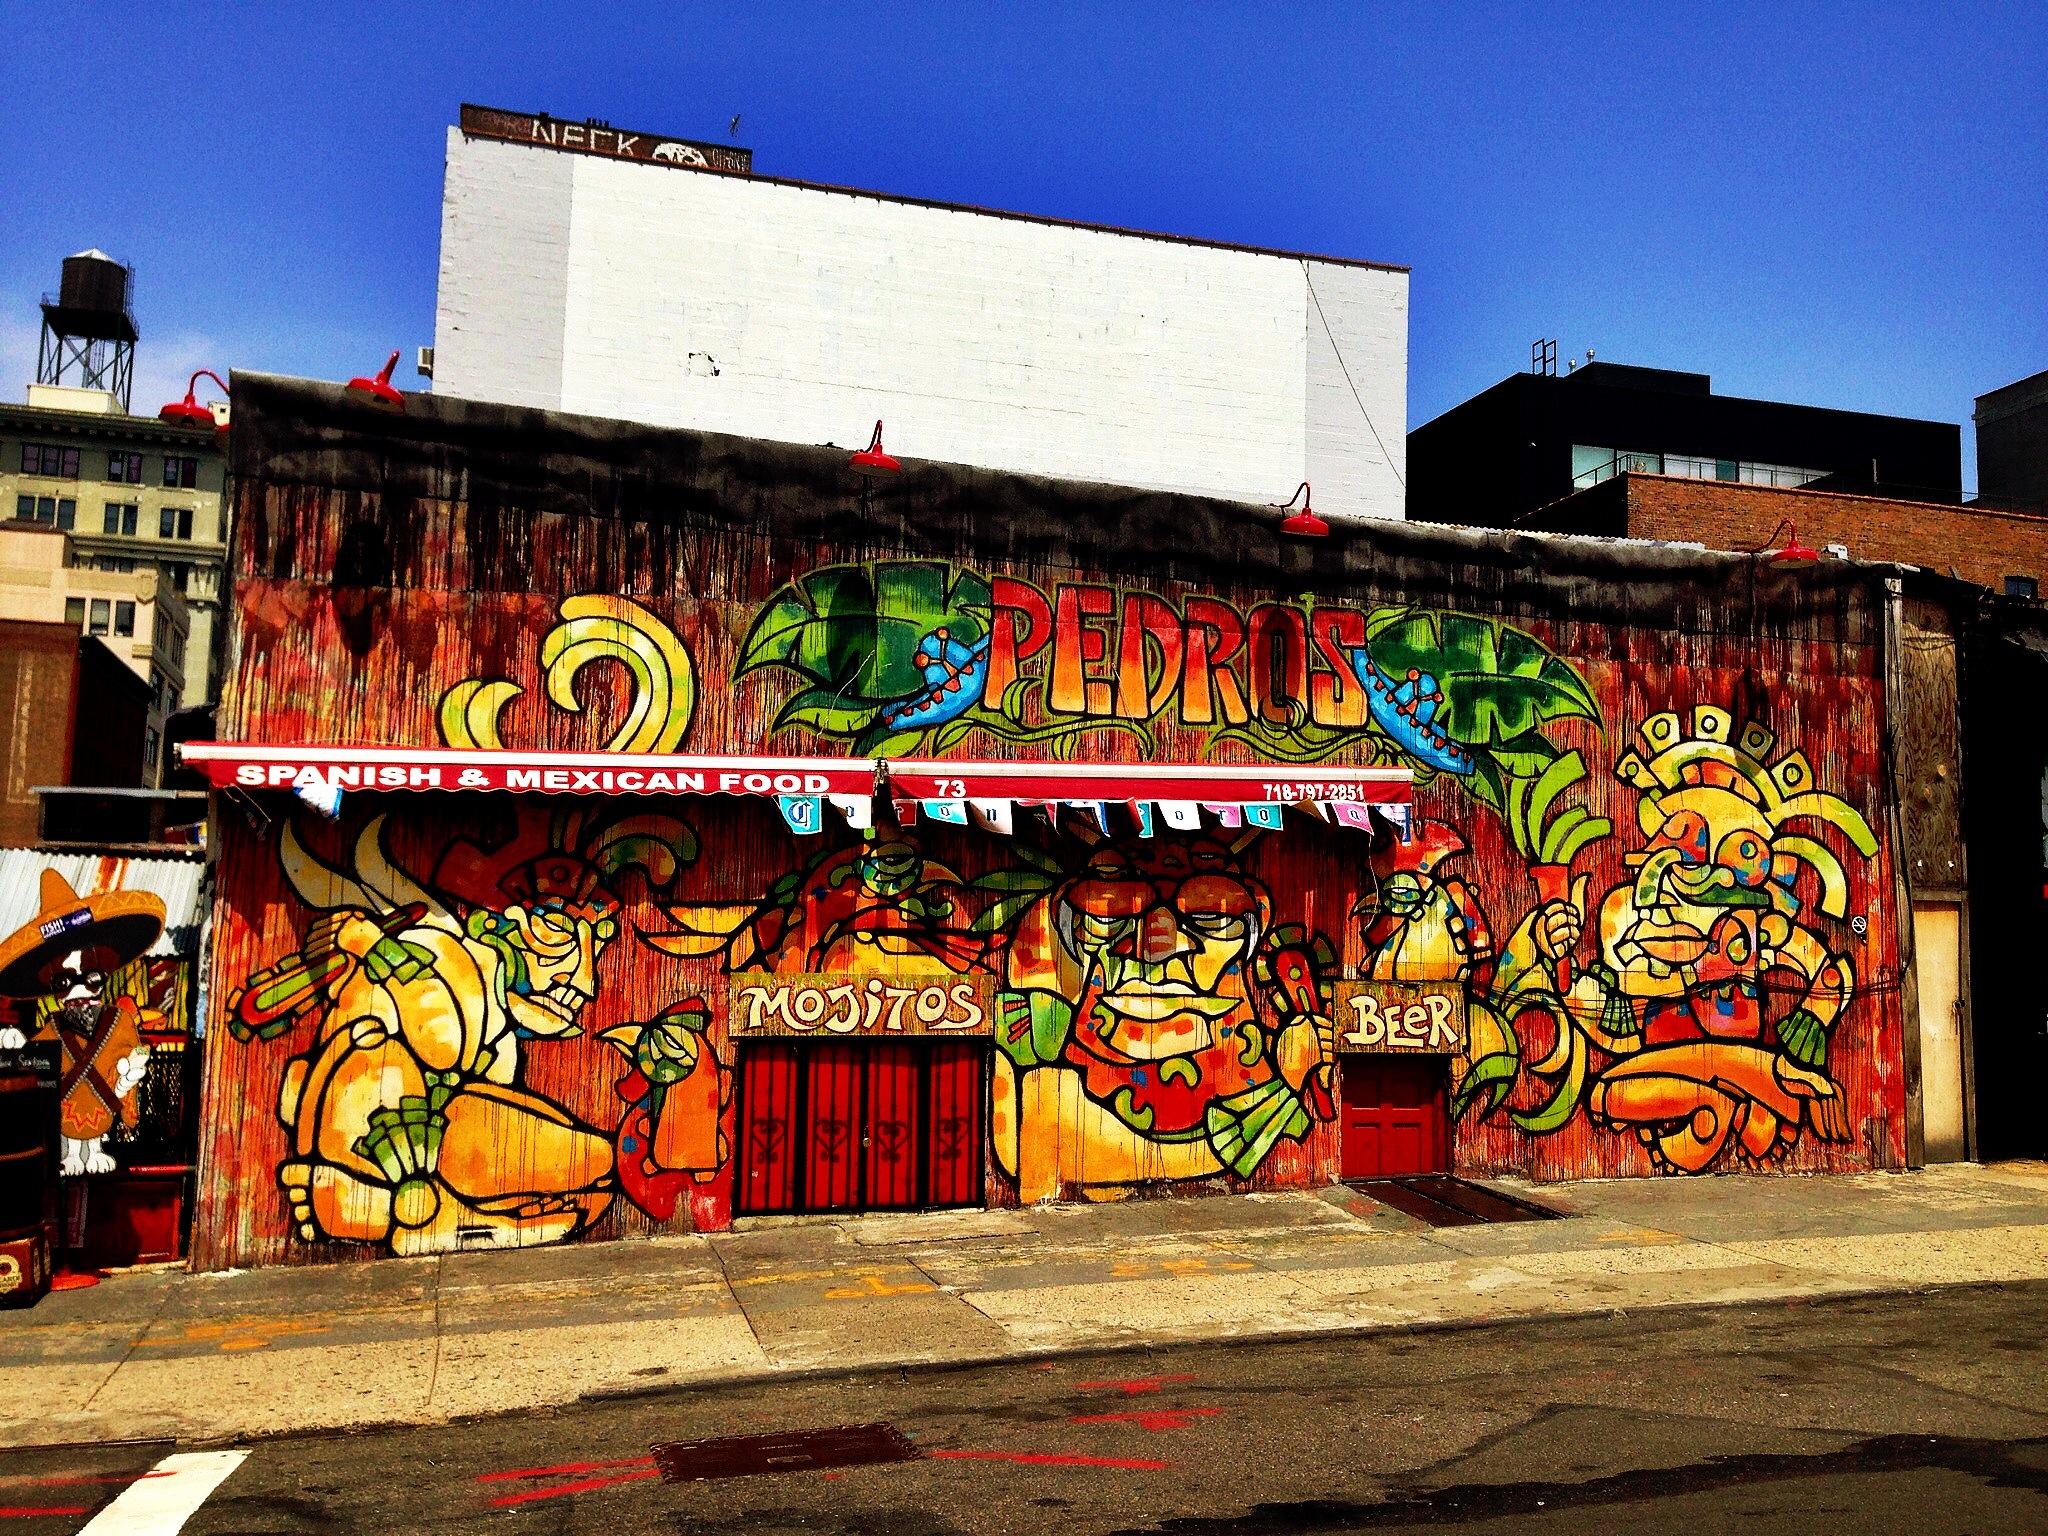 Pedro's Spanish & Mexican Food (Brooklyn, NYC)